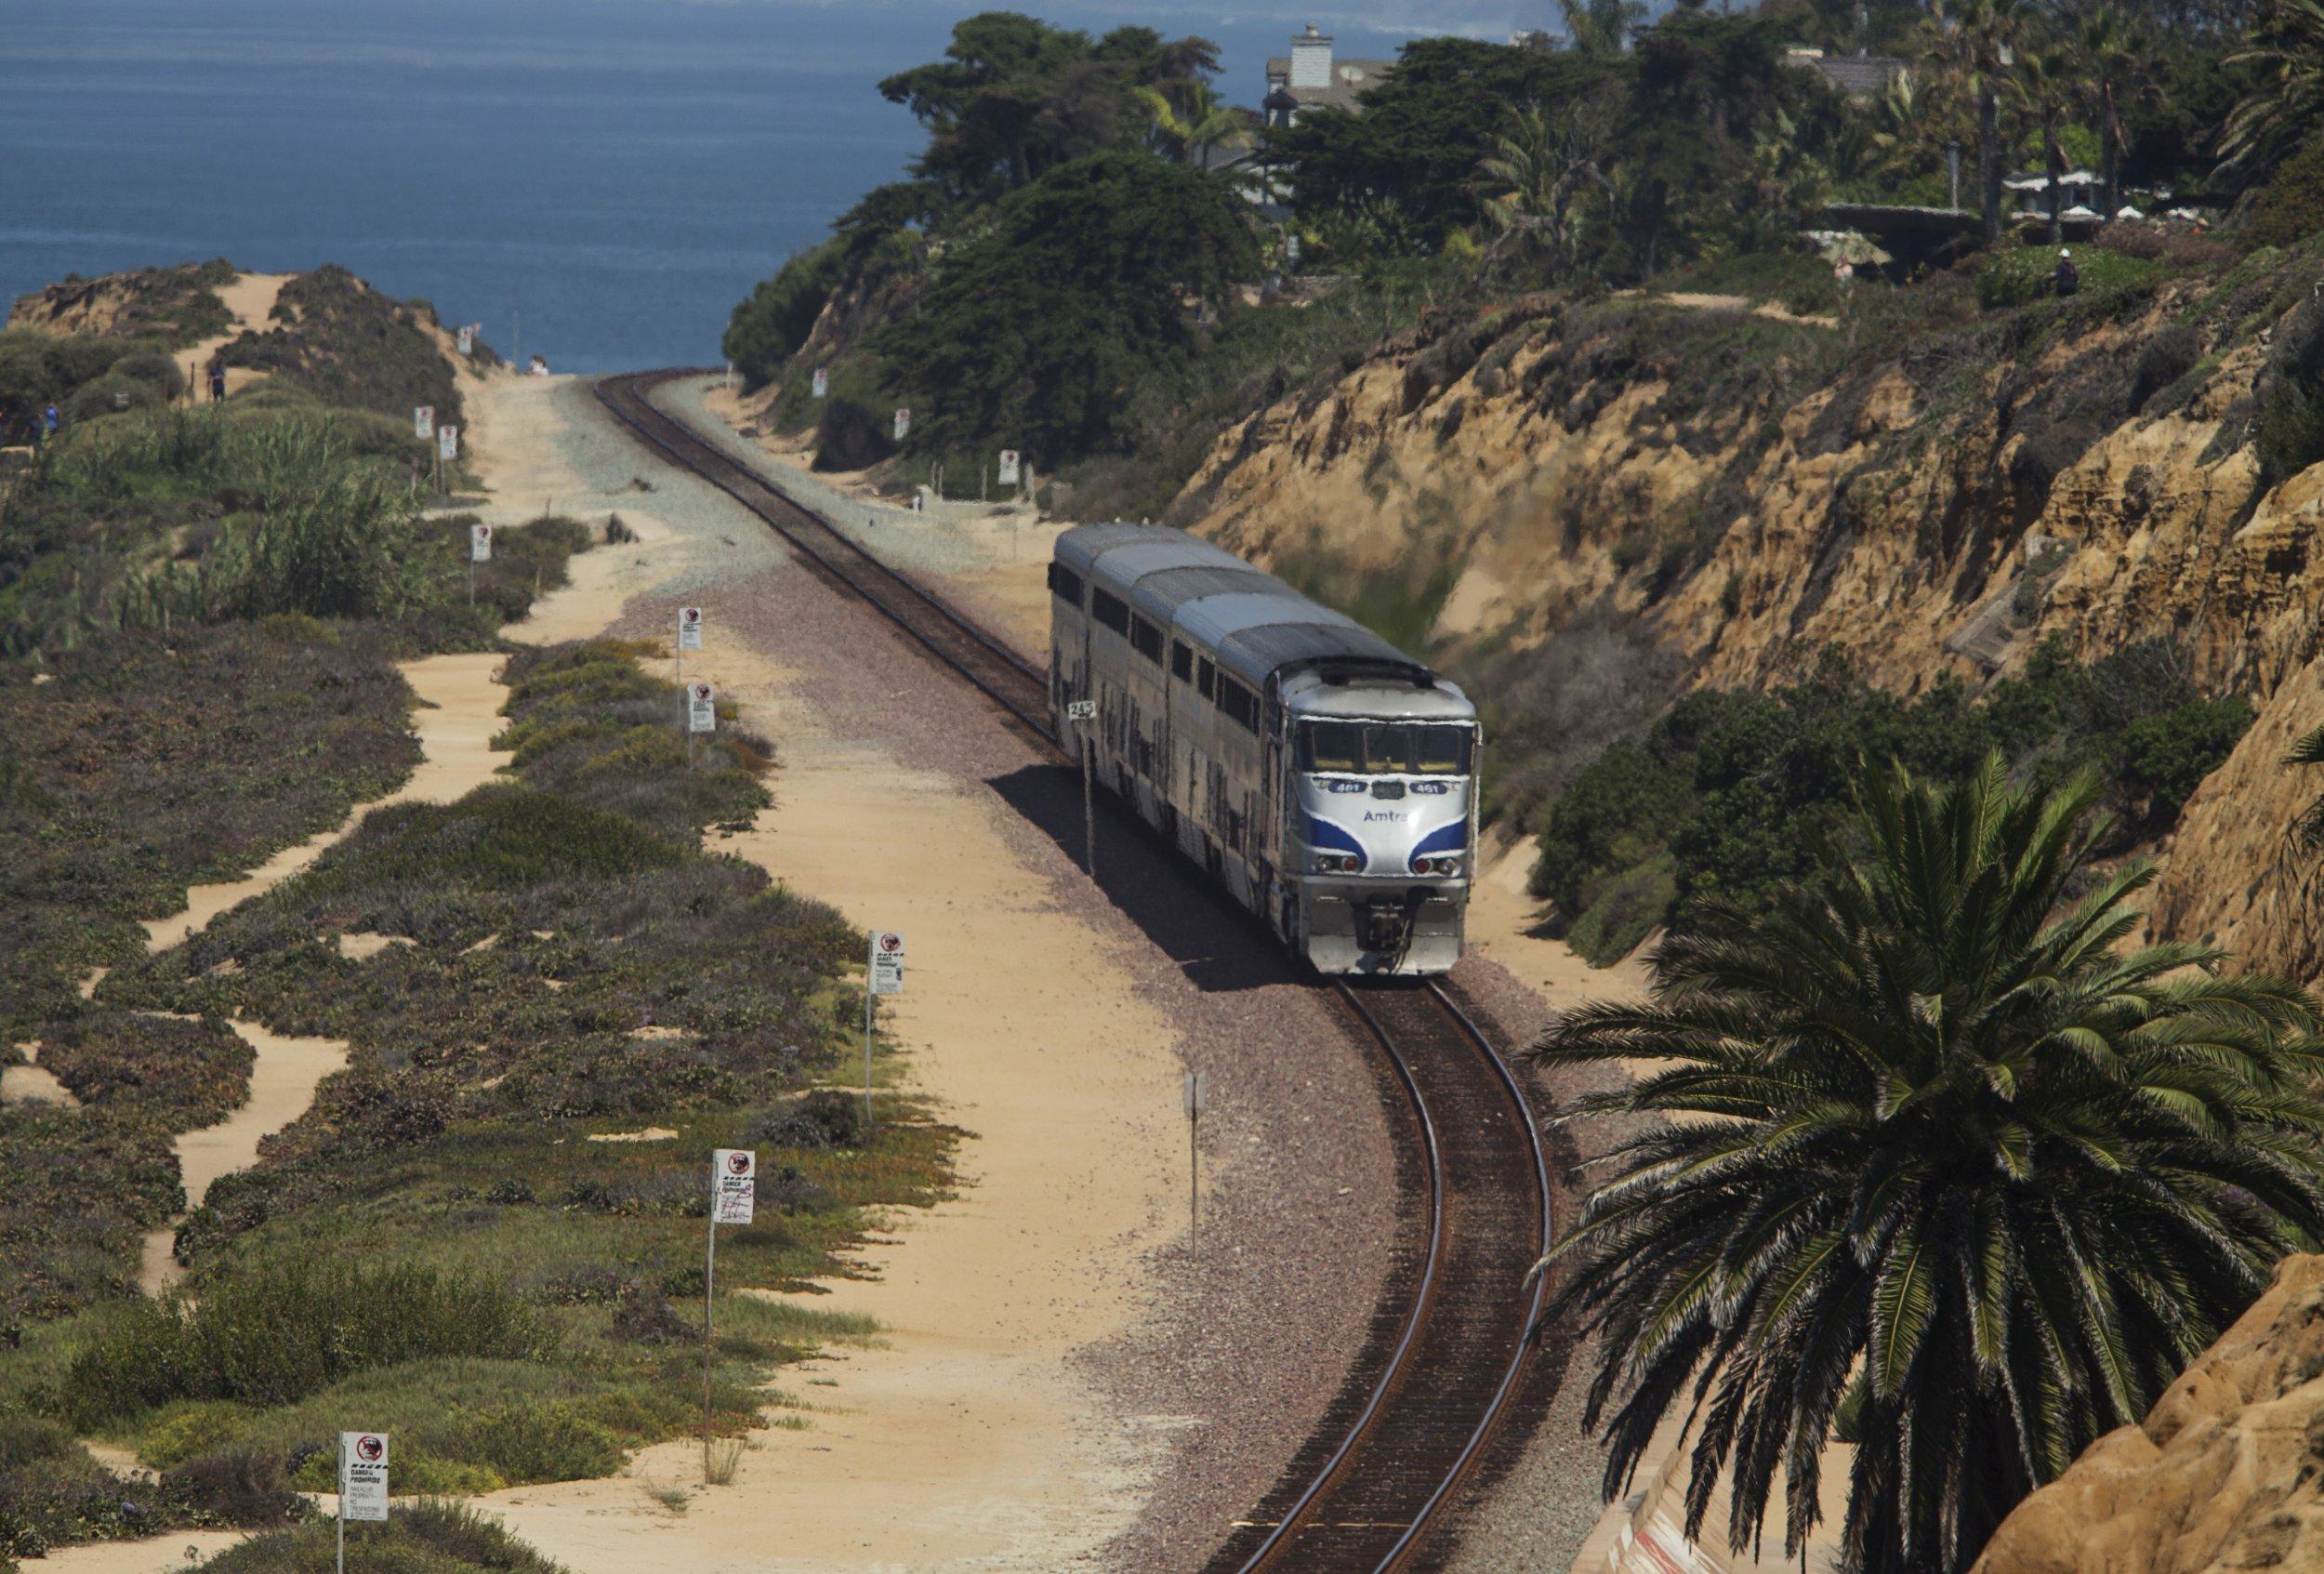 0828_Amtrak_collision_San_Diego_01